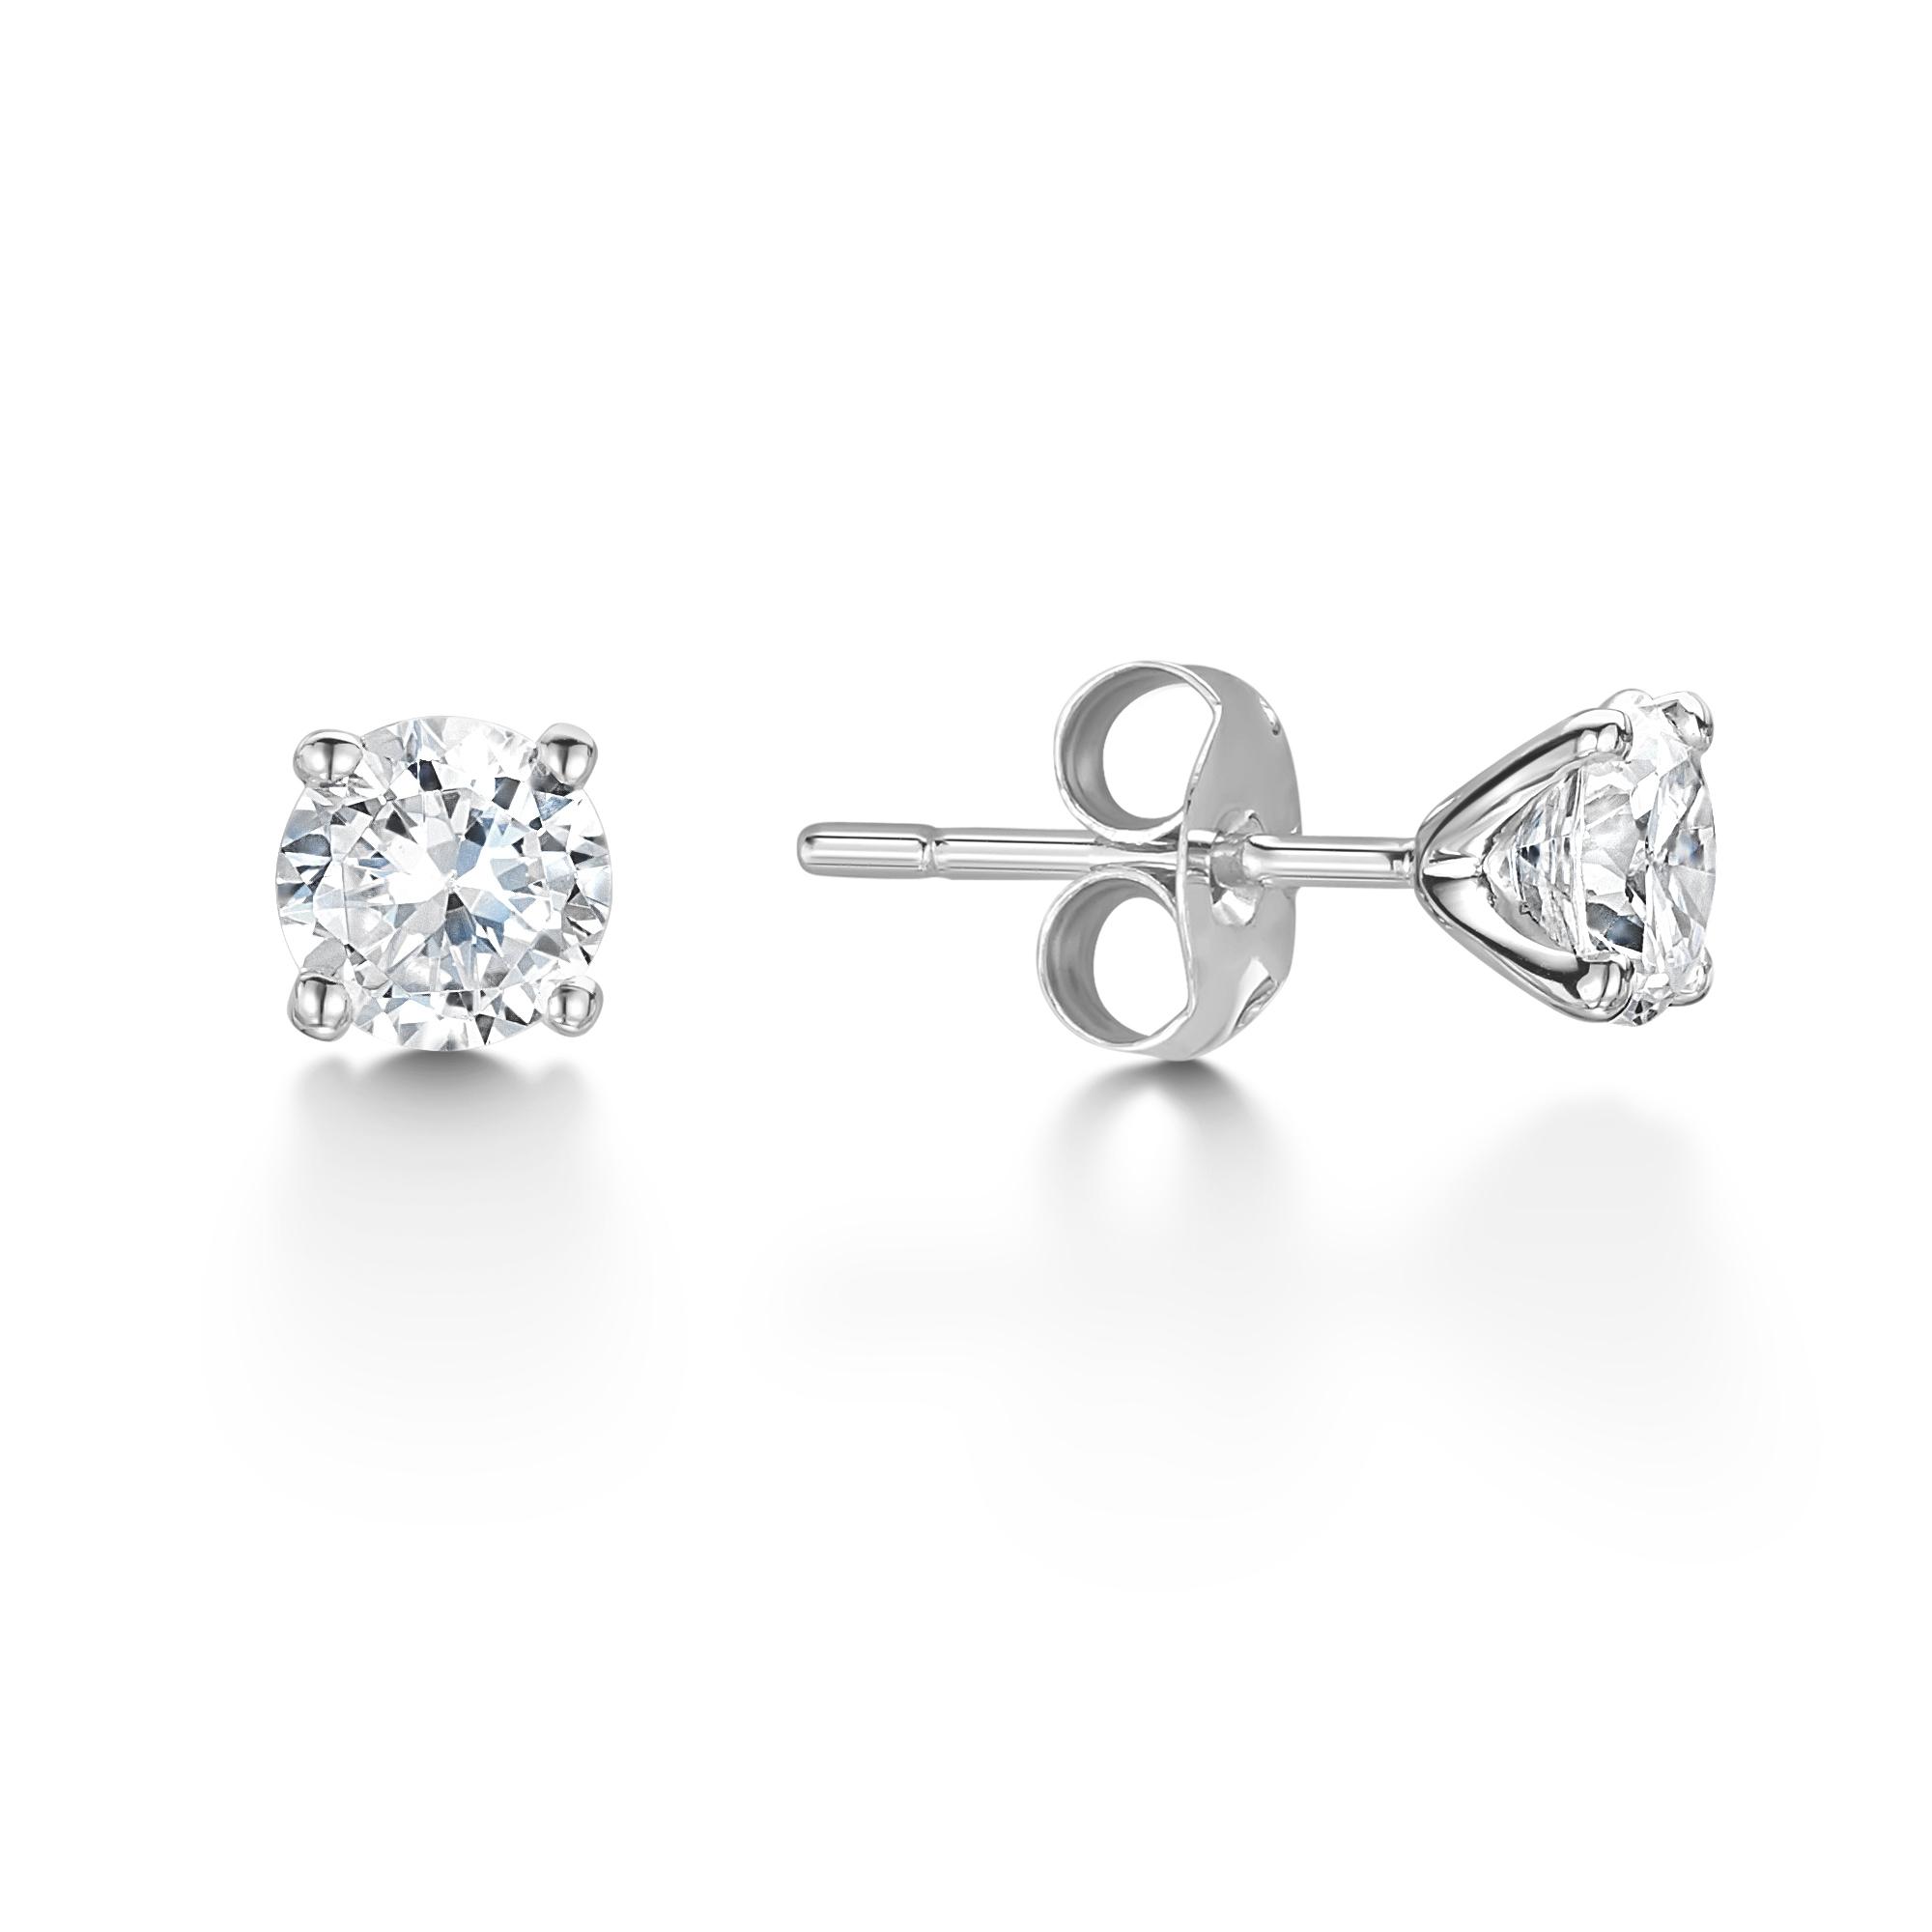 Excellent Value 2.01ct Diamond Stud Earrings-1457